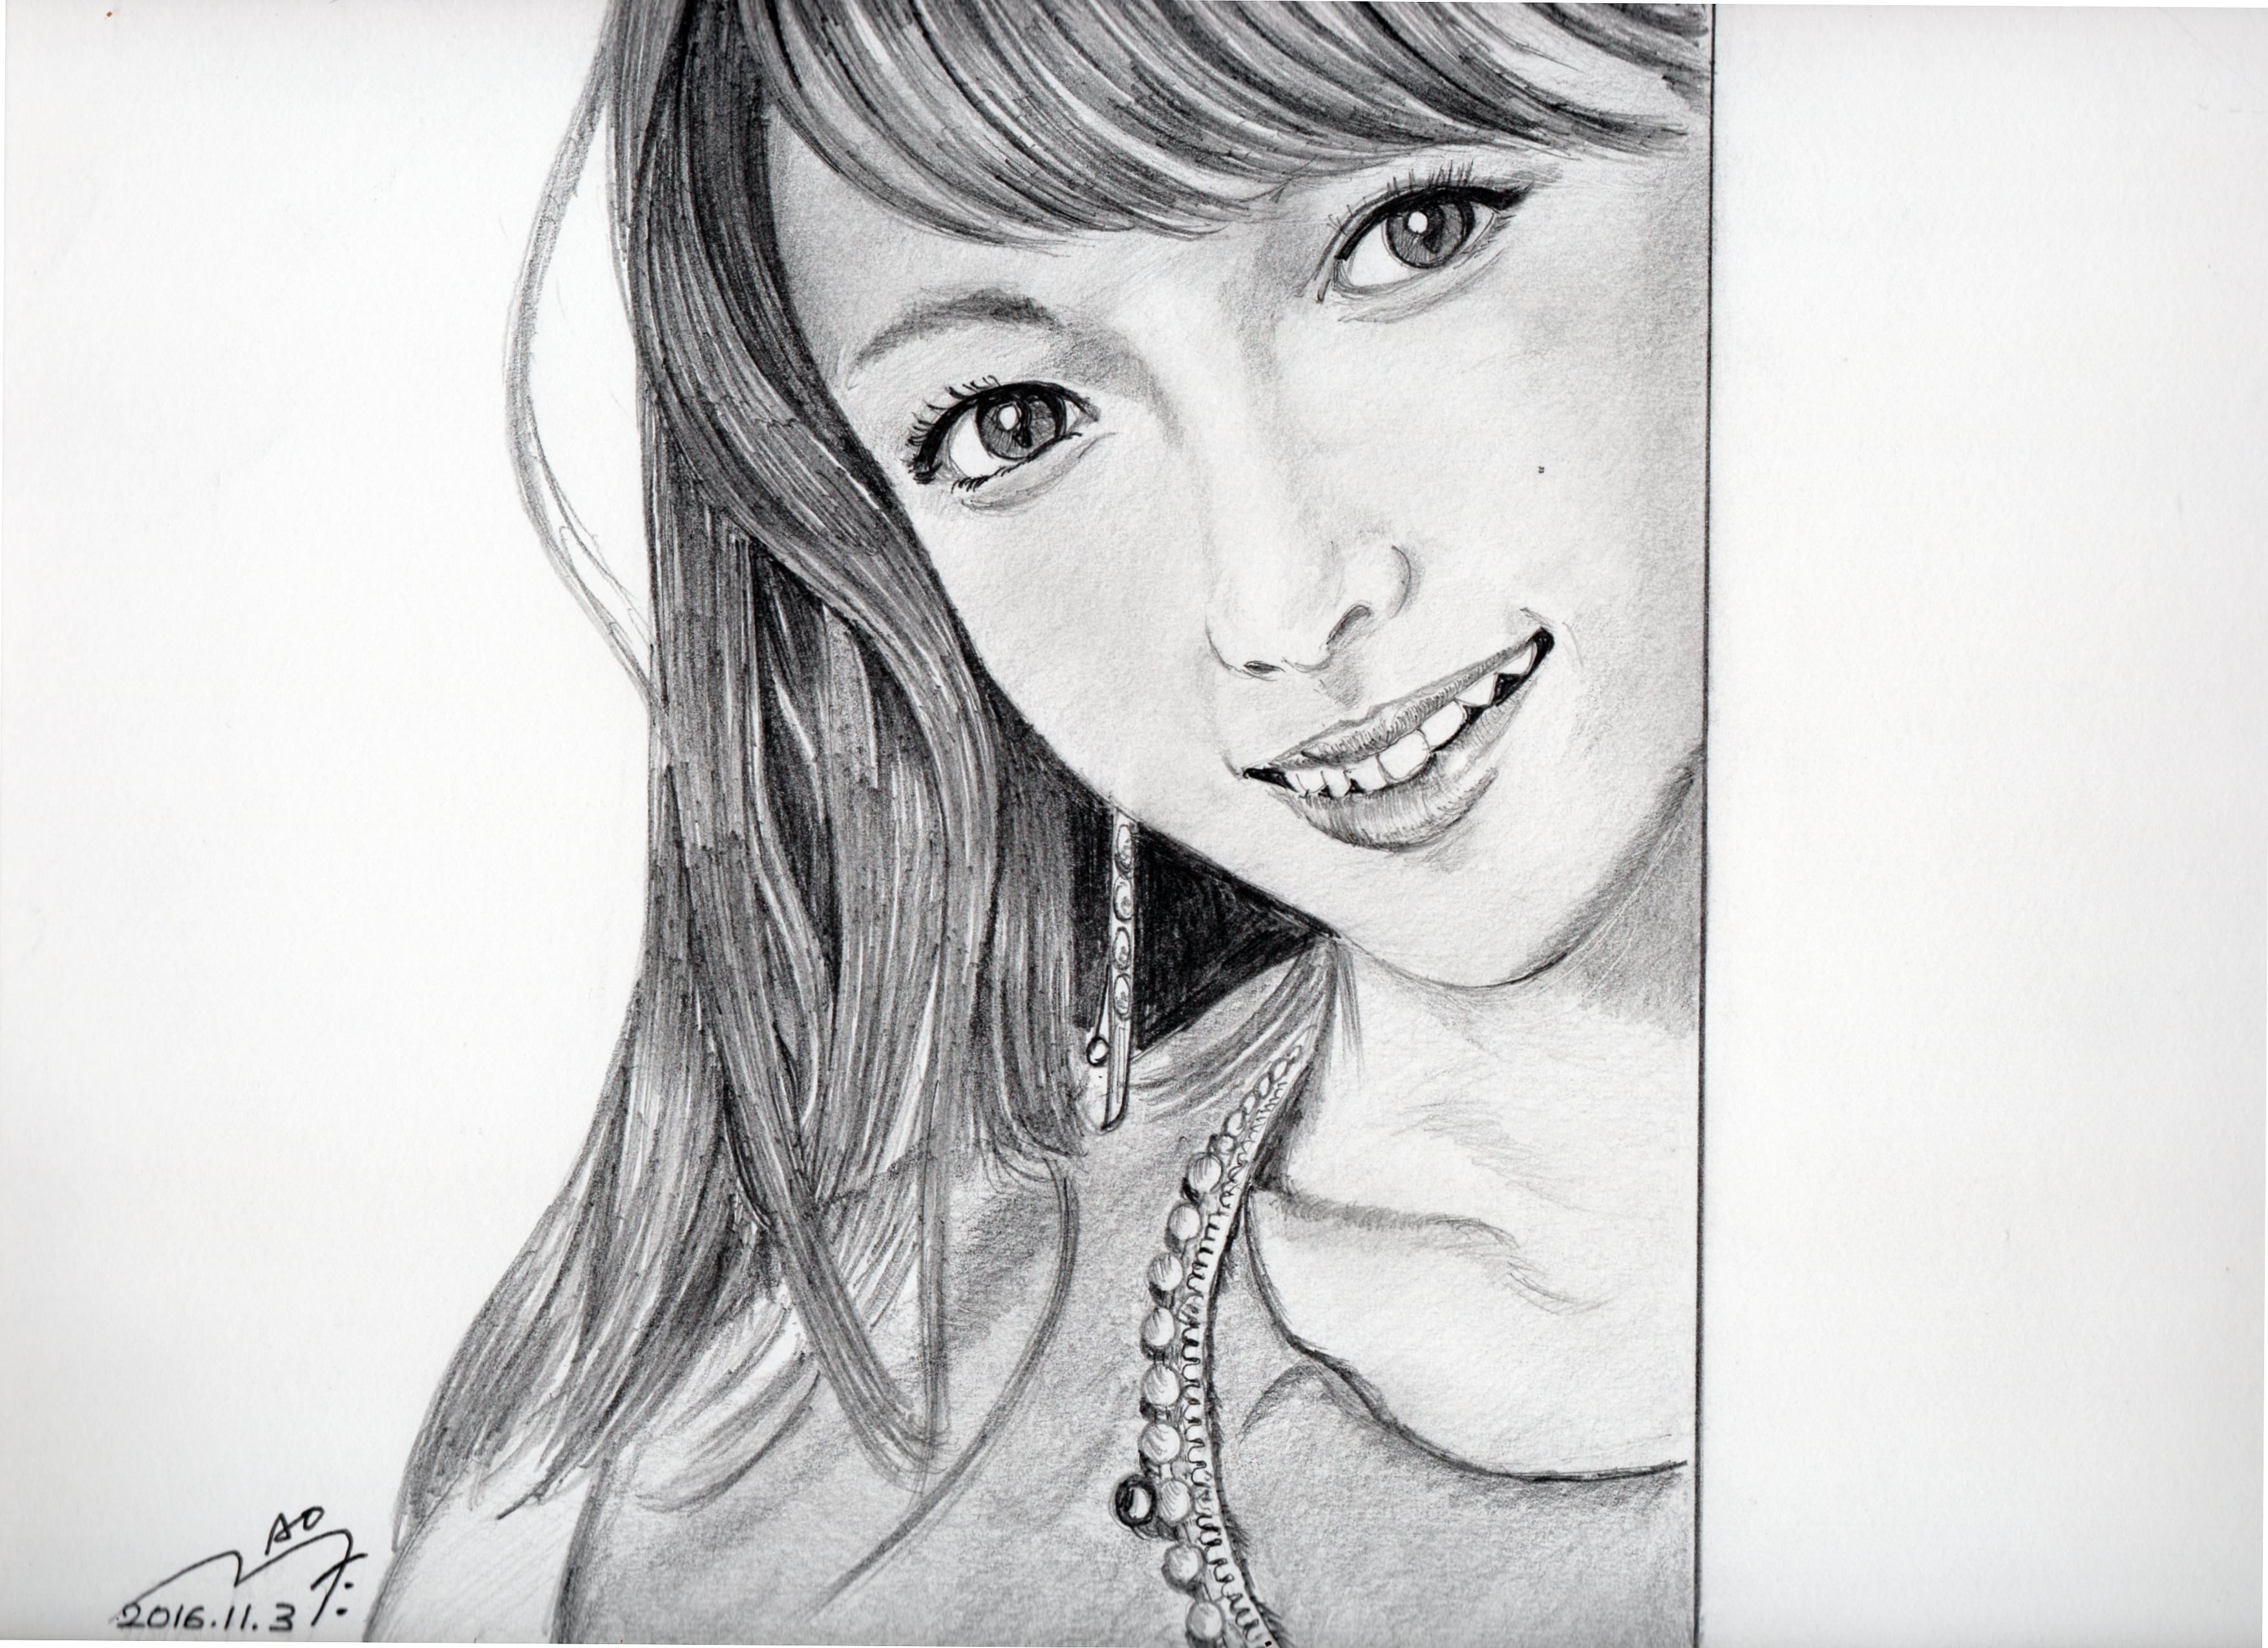 深田恭子の鉛筆画似顔絵